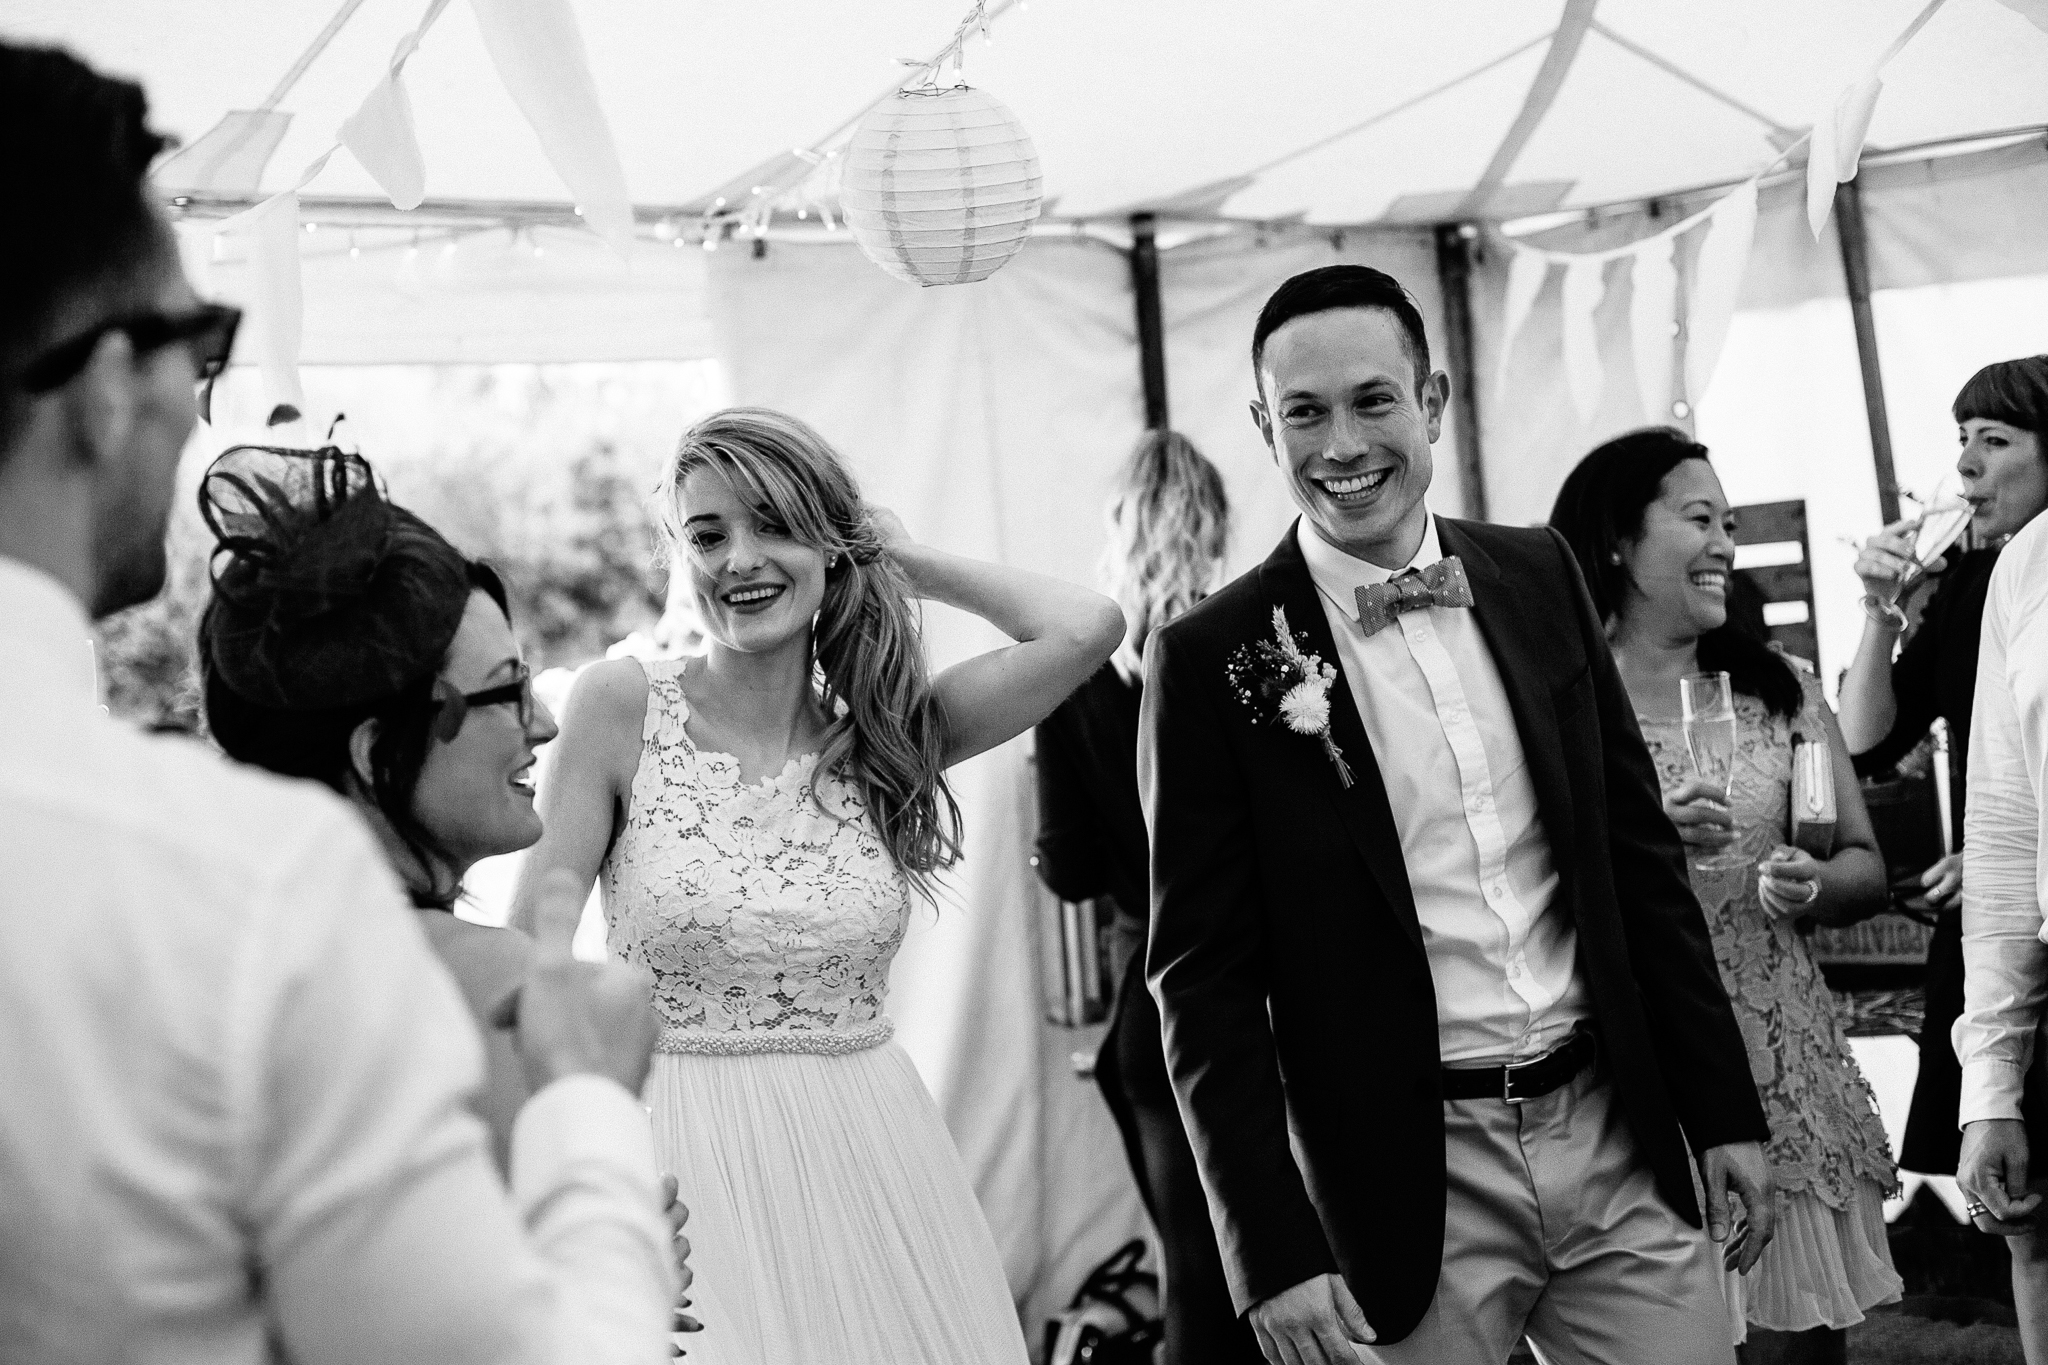 grantham_wedding_photographer-77.jpg